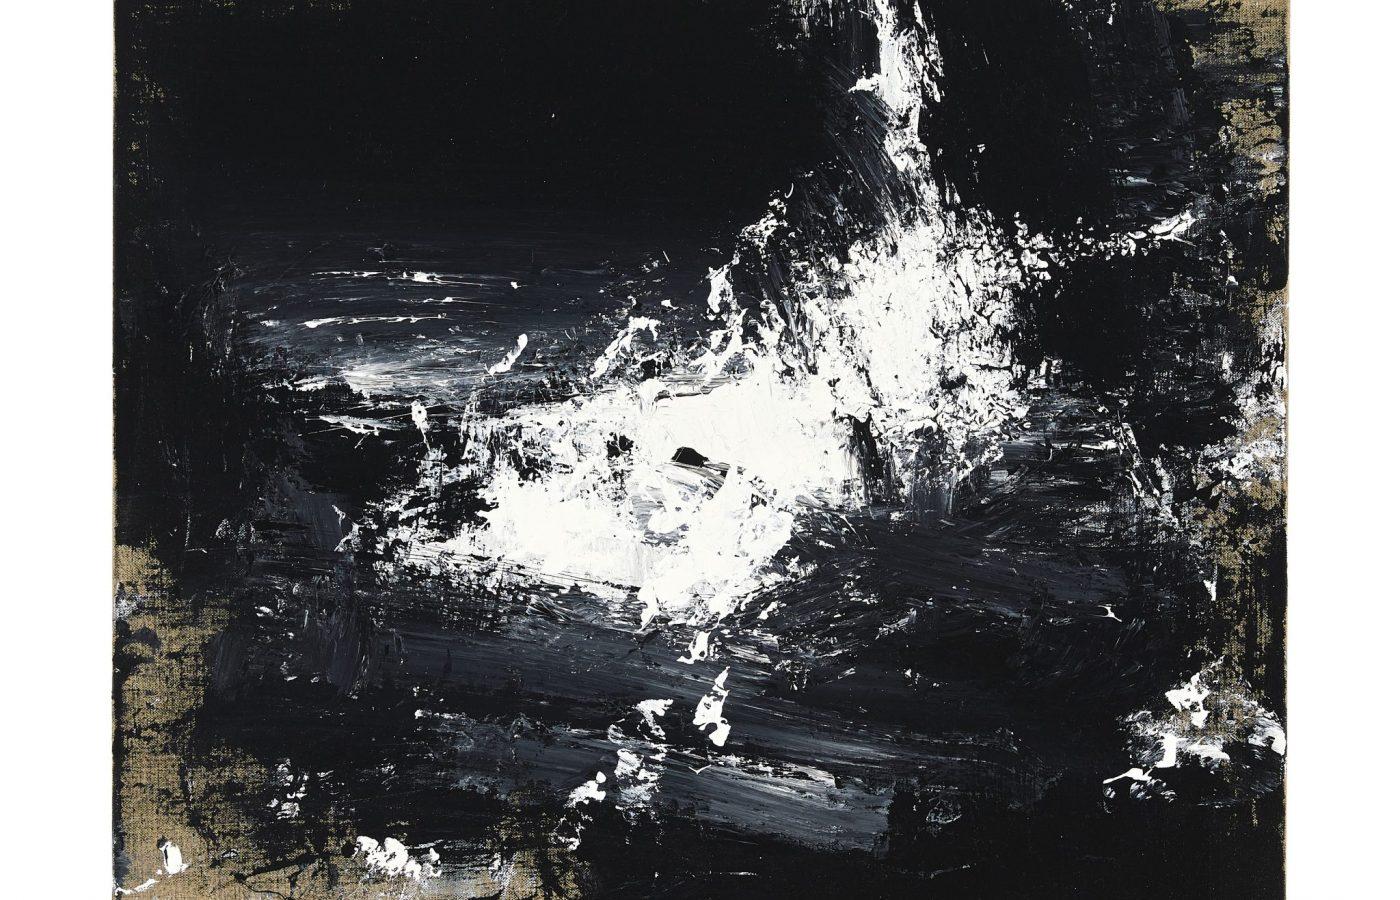 FXF18-61 John Virtue Untitled No 17 2016-17